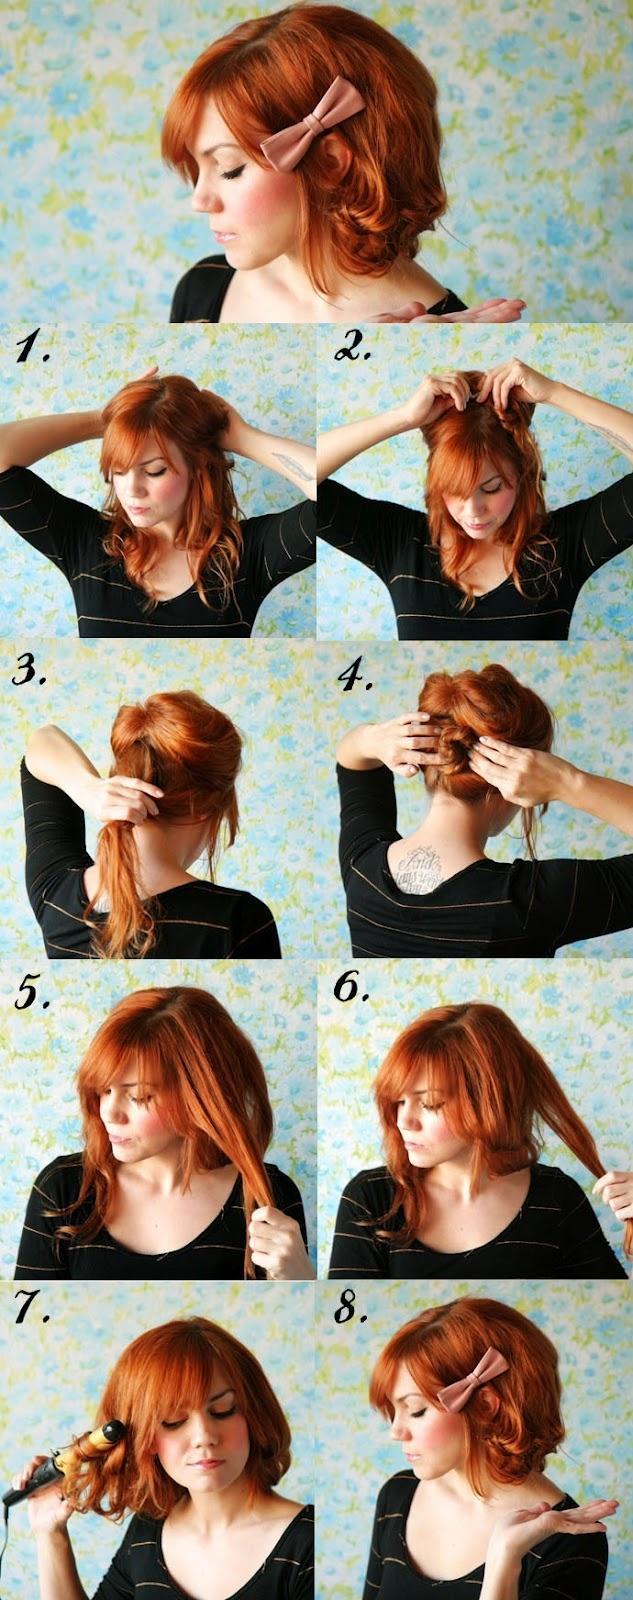 Прически на средний волос с челкой в домашних условиях фото